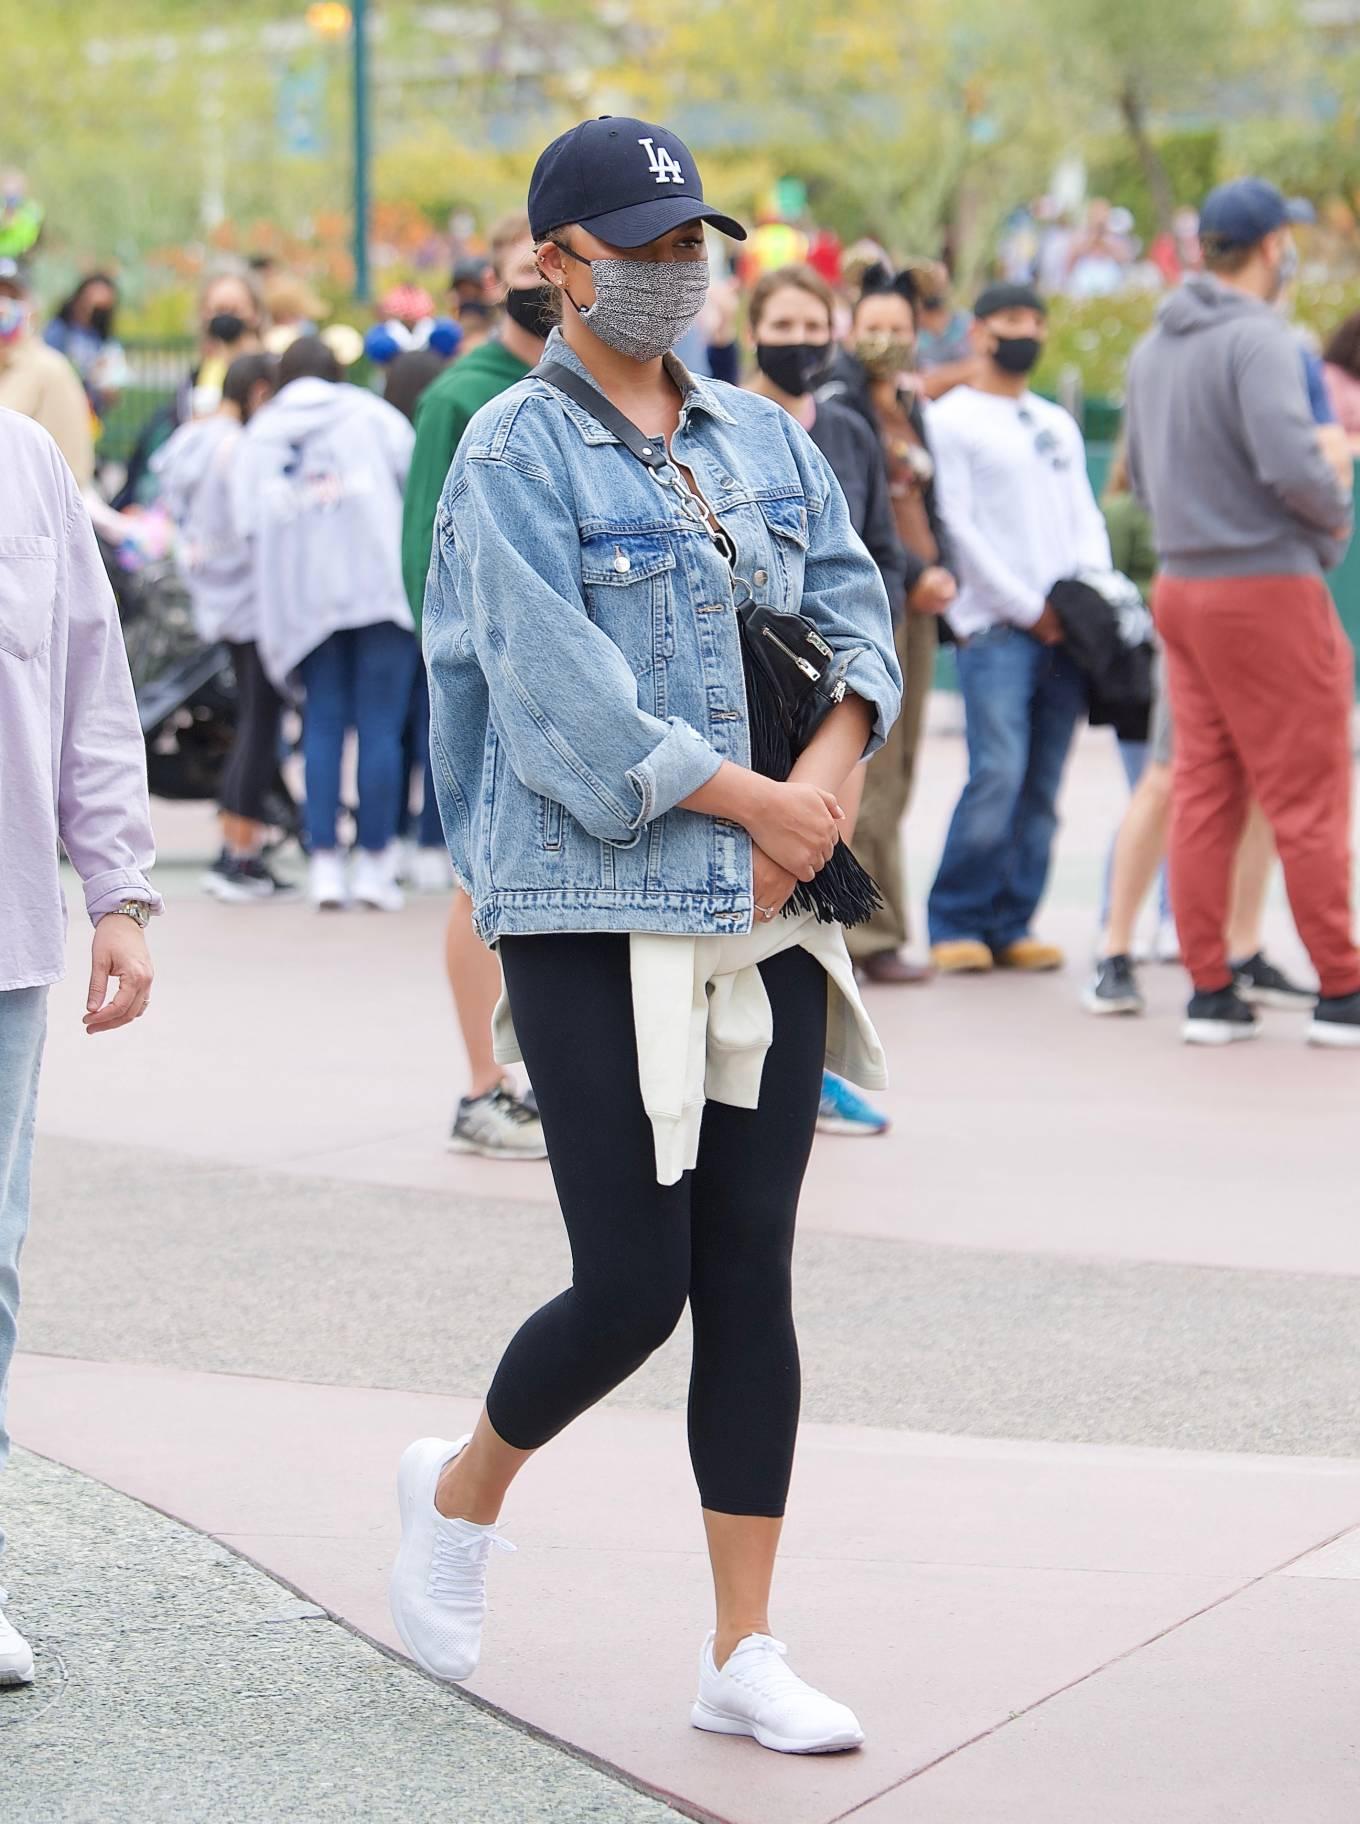 Chrissy Teigen - family day at Disneyland in Los Angeles